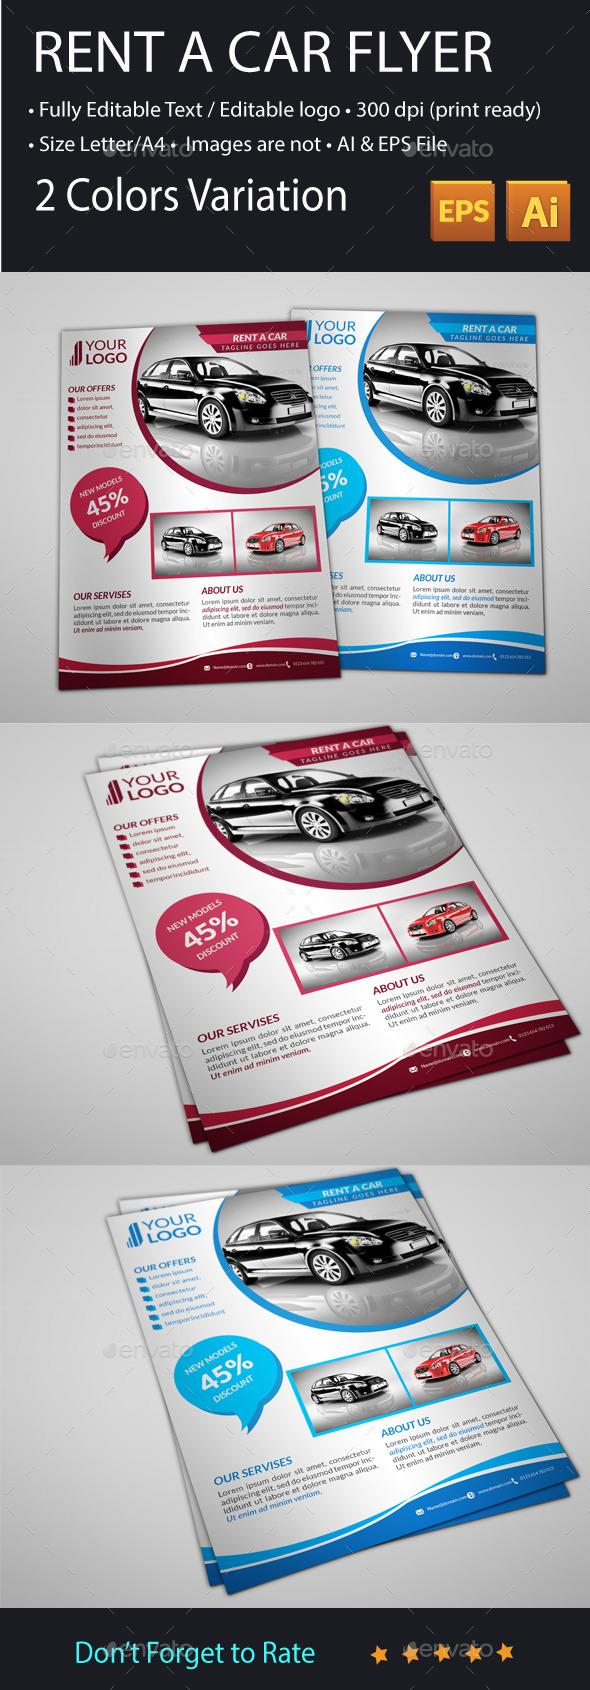 GraphicRiver Rent A Car Flyer 11277914